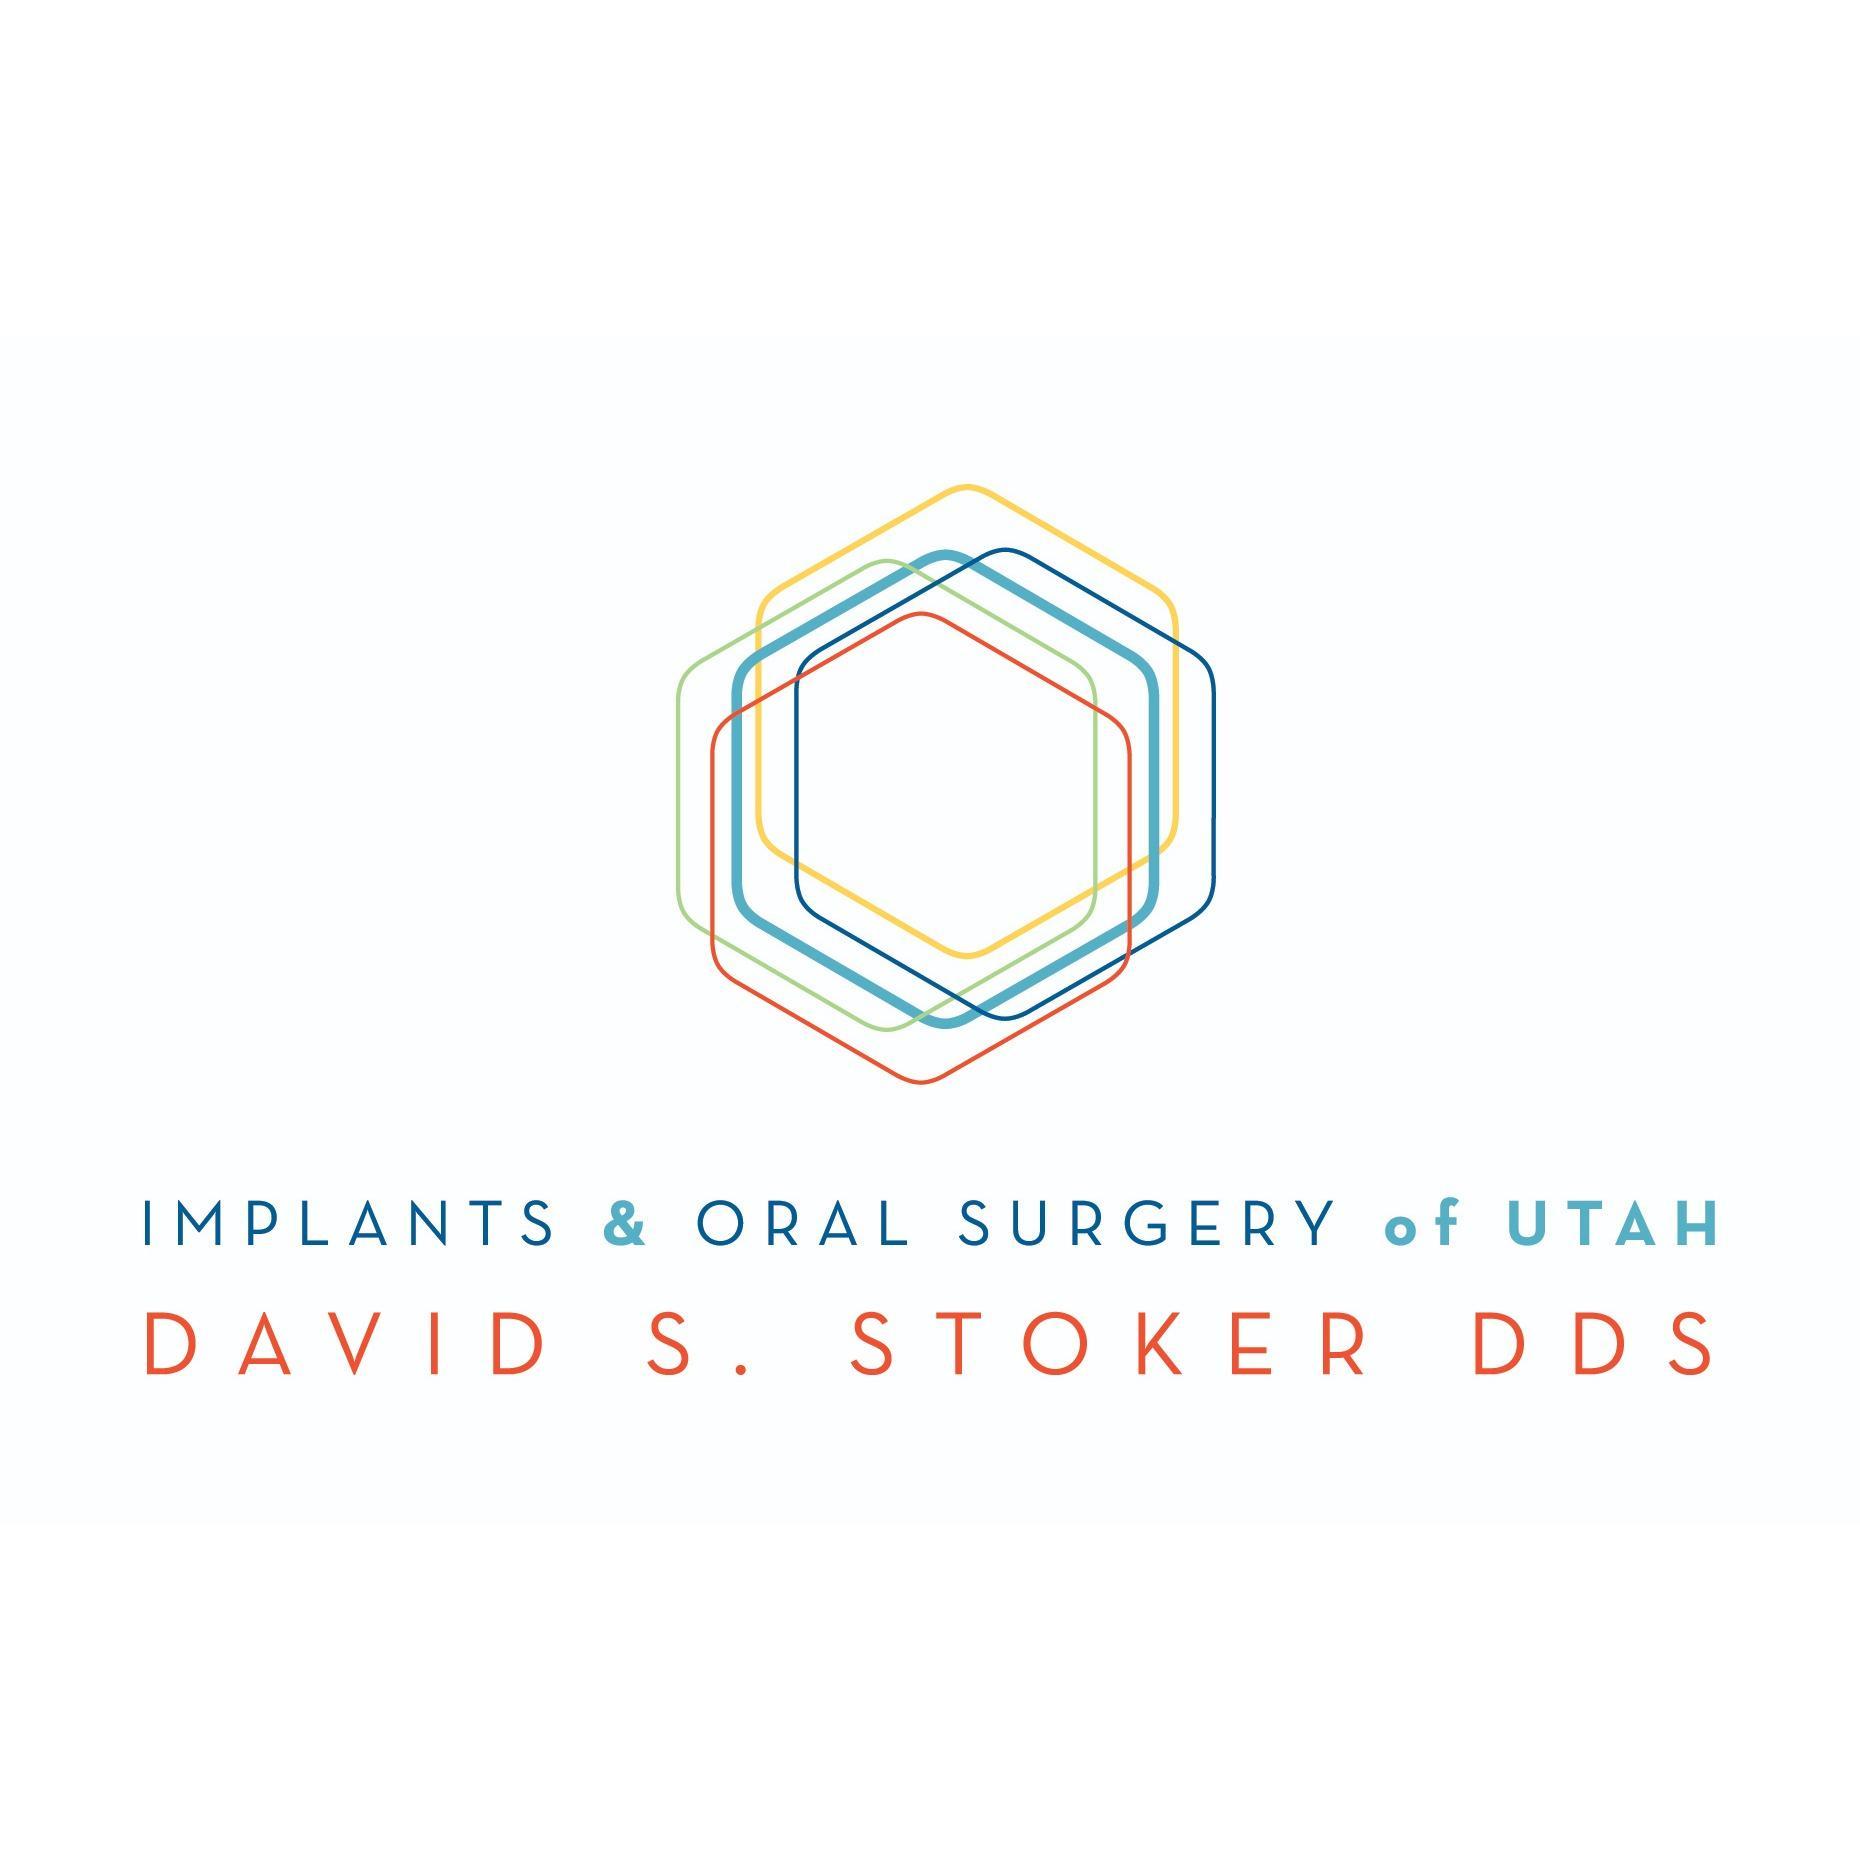 David S. Stoker, DDS